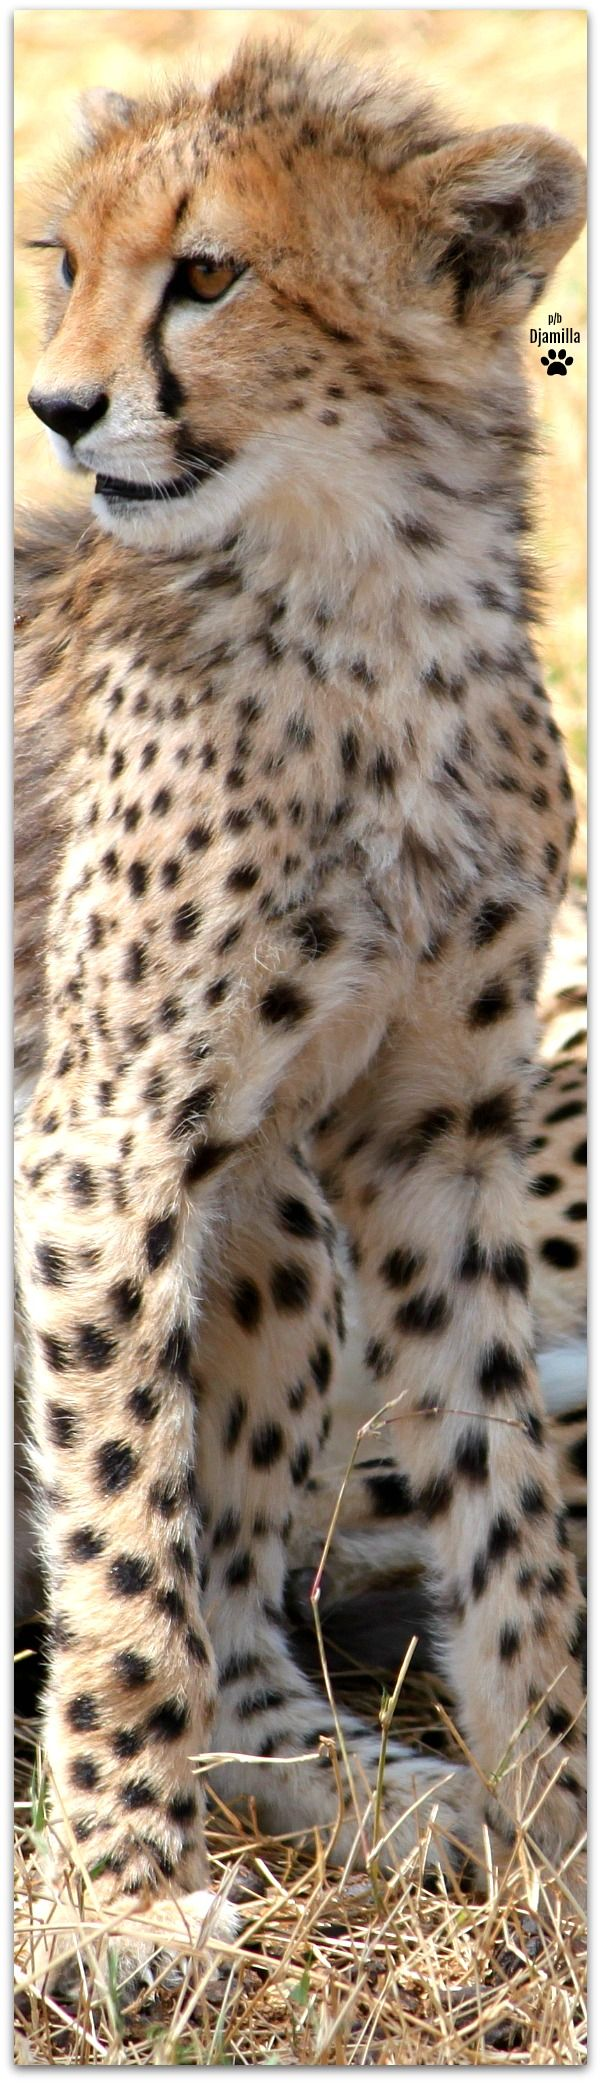 best 25 cheetah animal ideas on pinterest cheetah baby